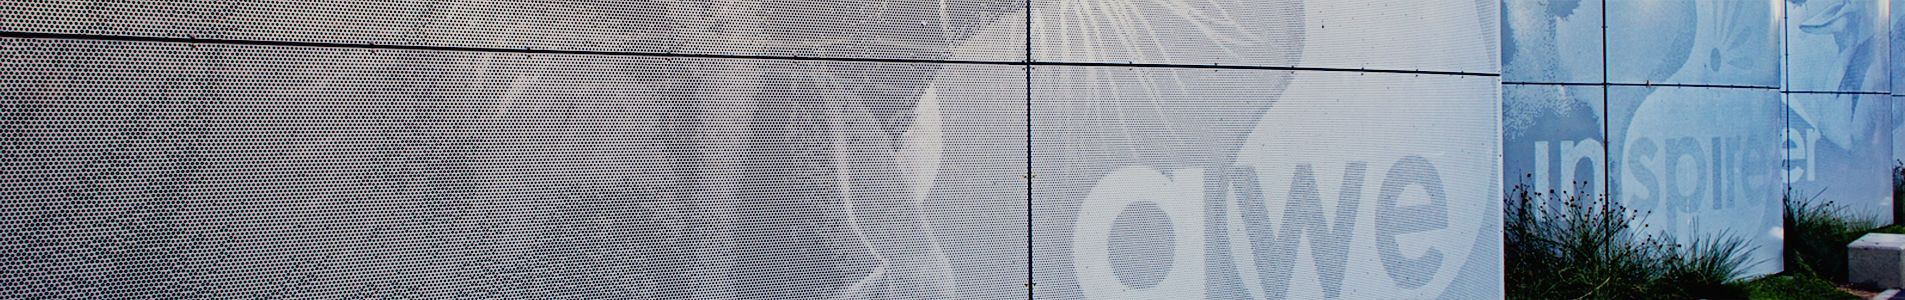 Substation fence art